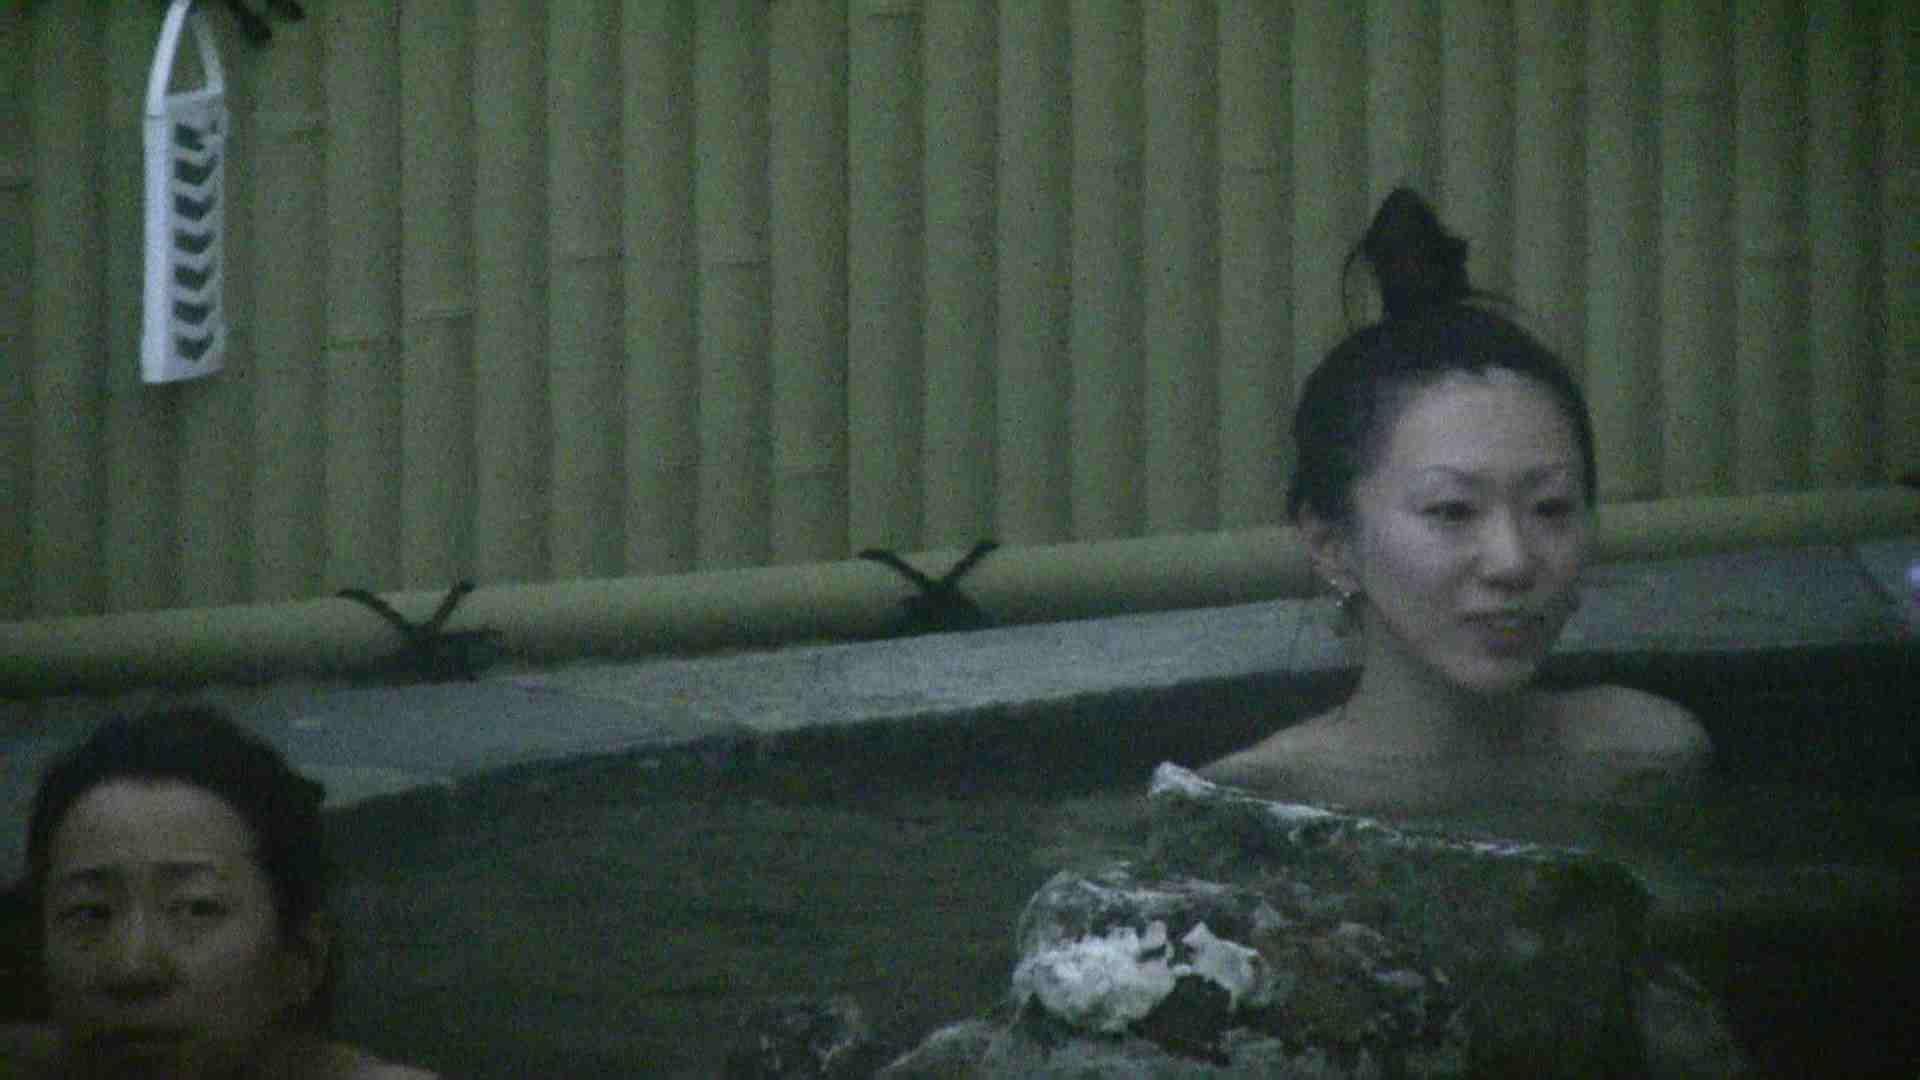 Aquaな露天風呂Vol.587 盗撮  29連発 12